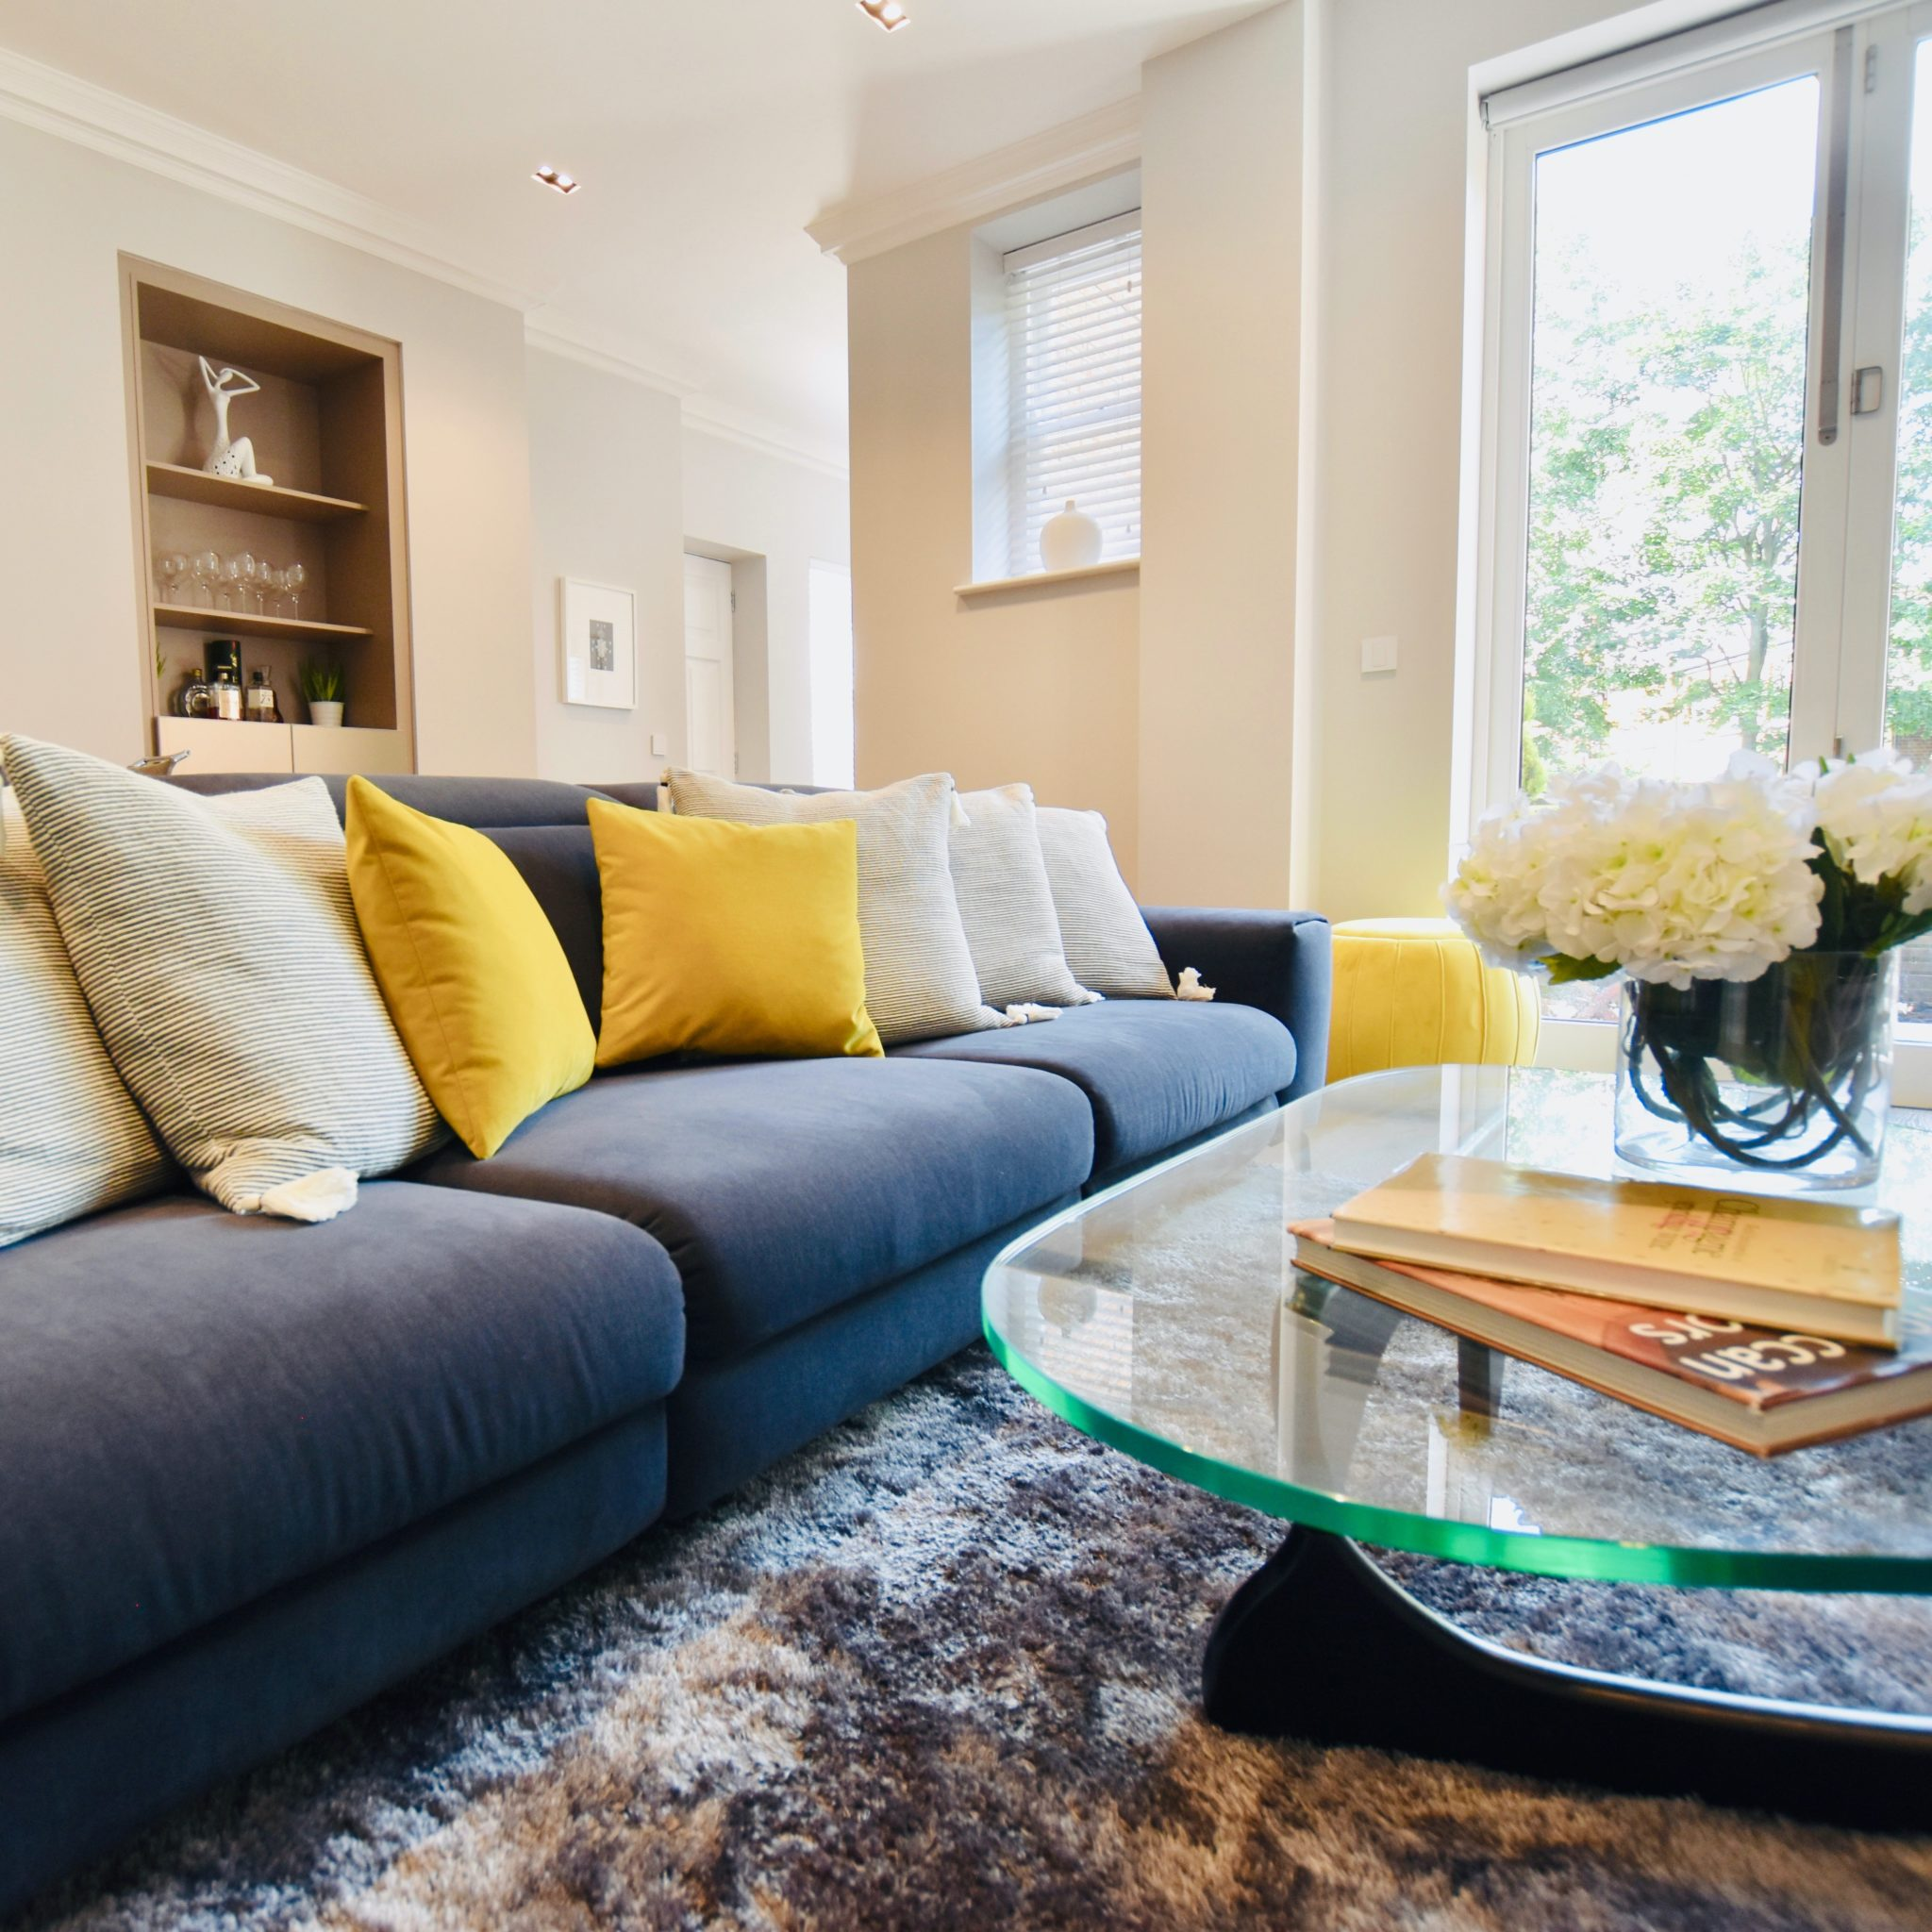 Staged sofa